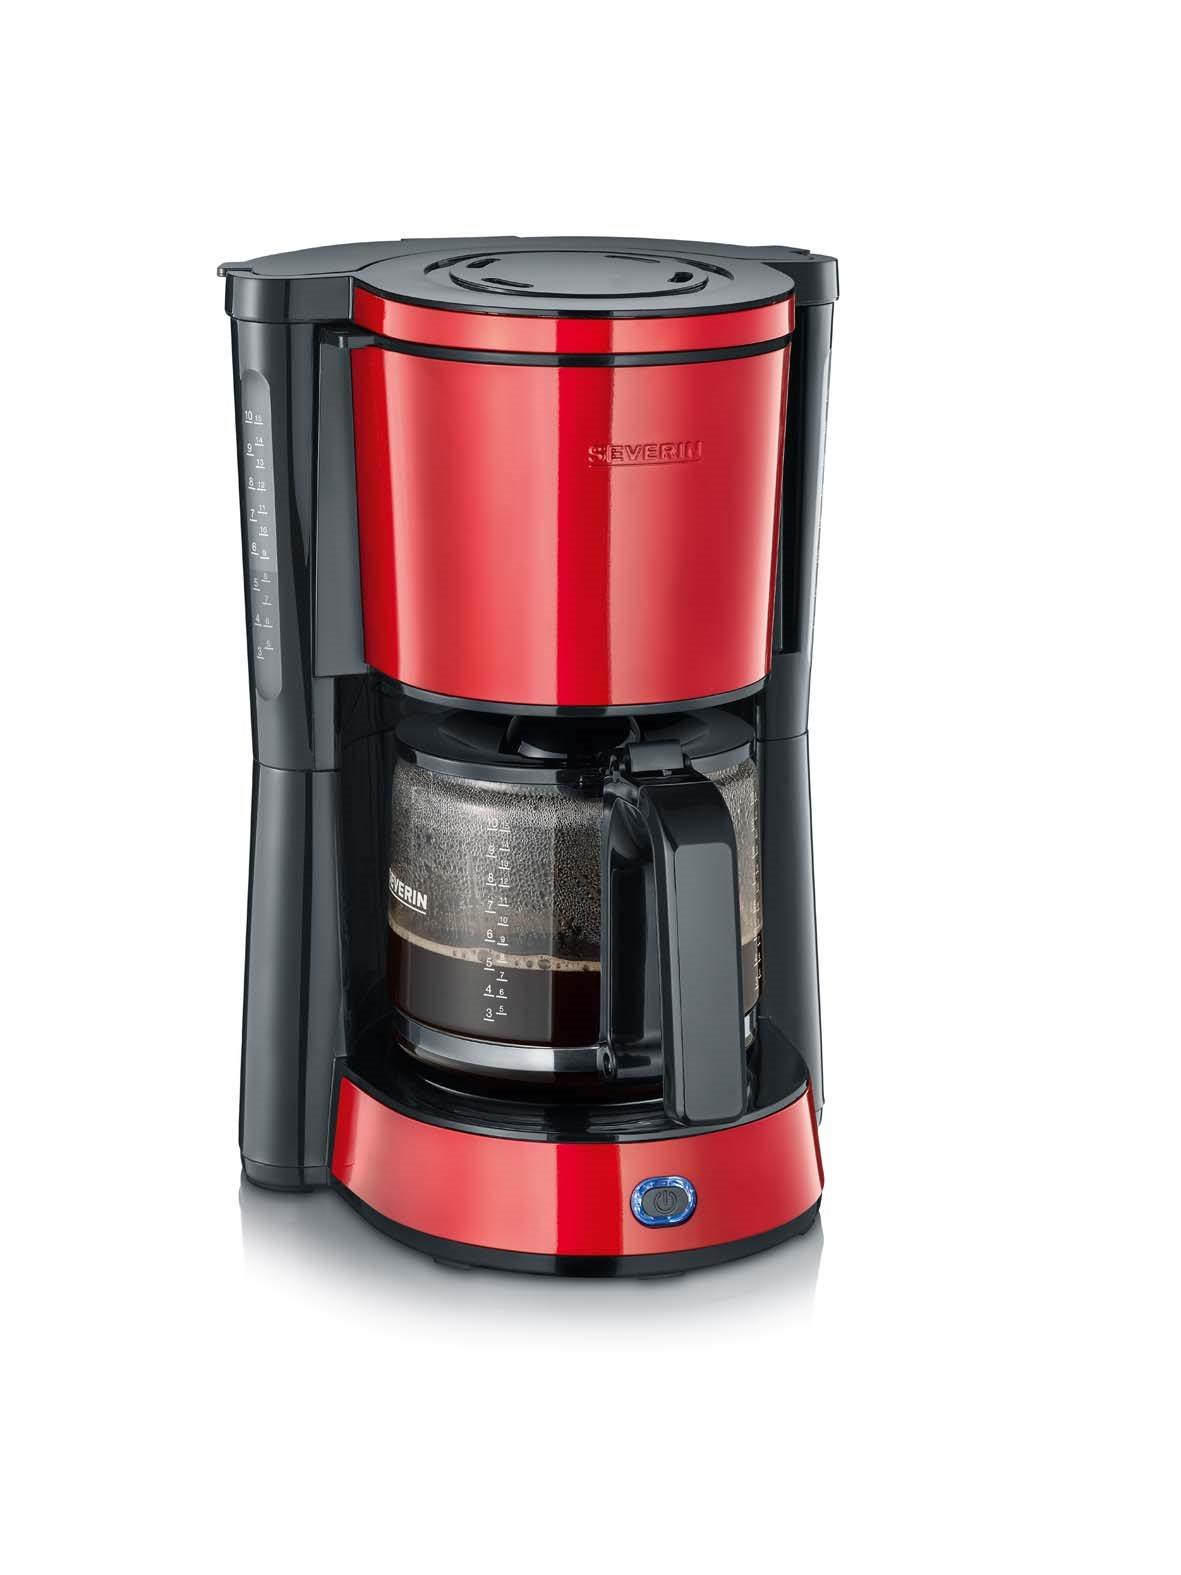 SEVERIN Καφετιέρα ''Type'' 1000W, 10 Φλυτζάνια Κόκκινη-Μαύρη - 4817